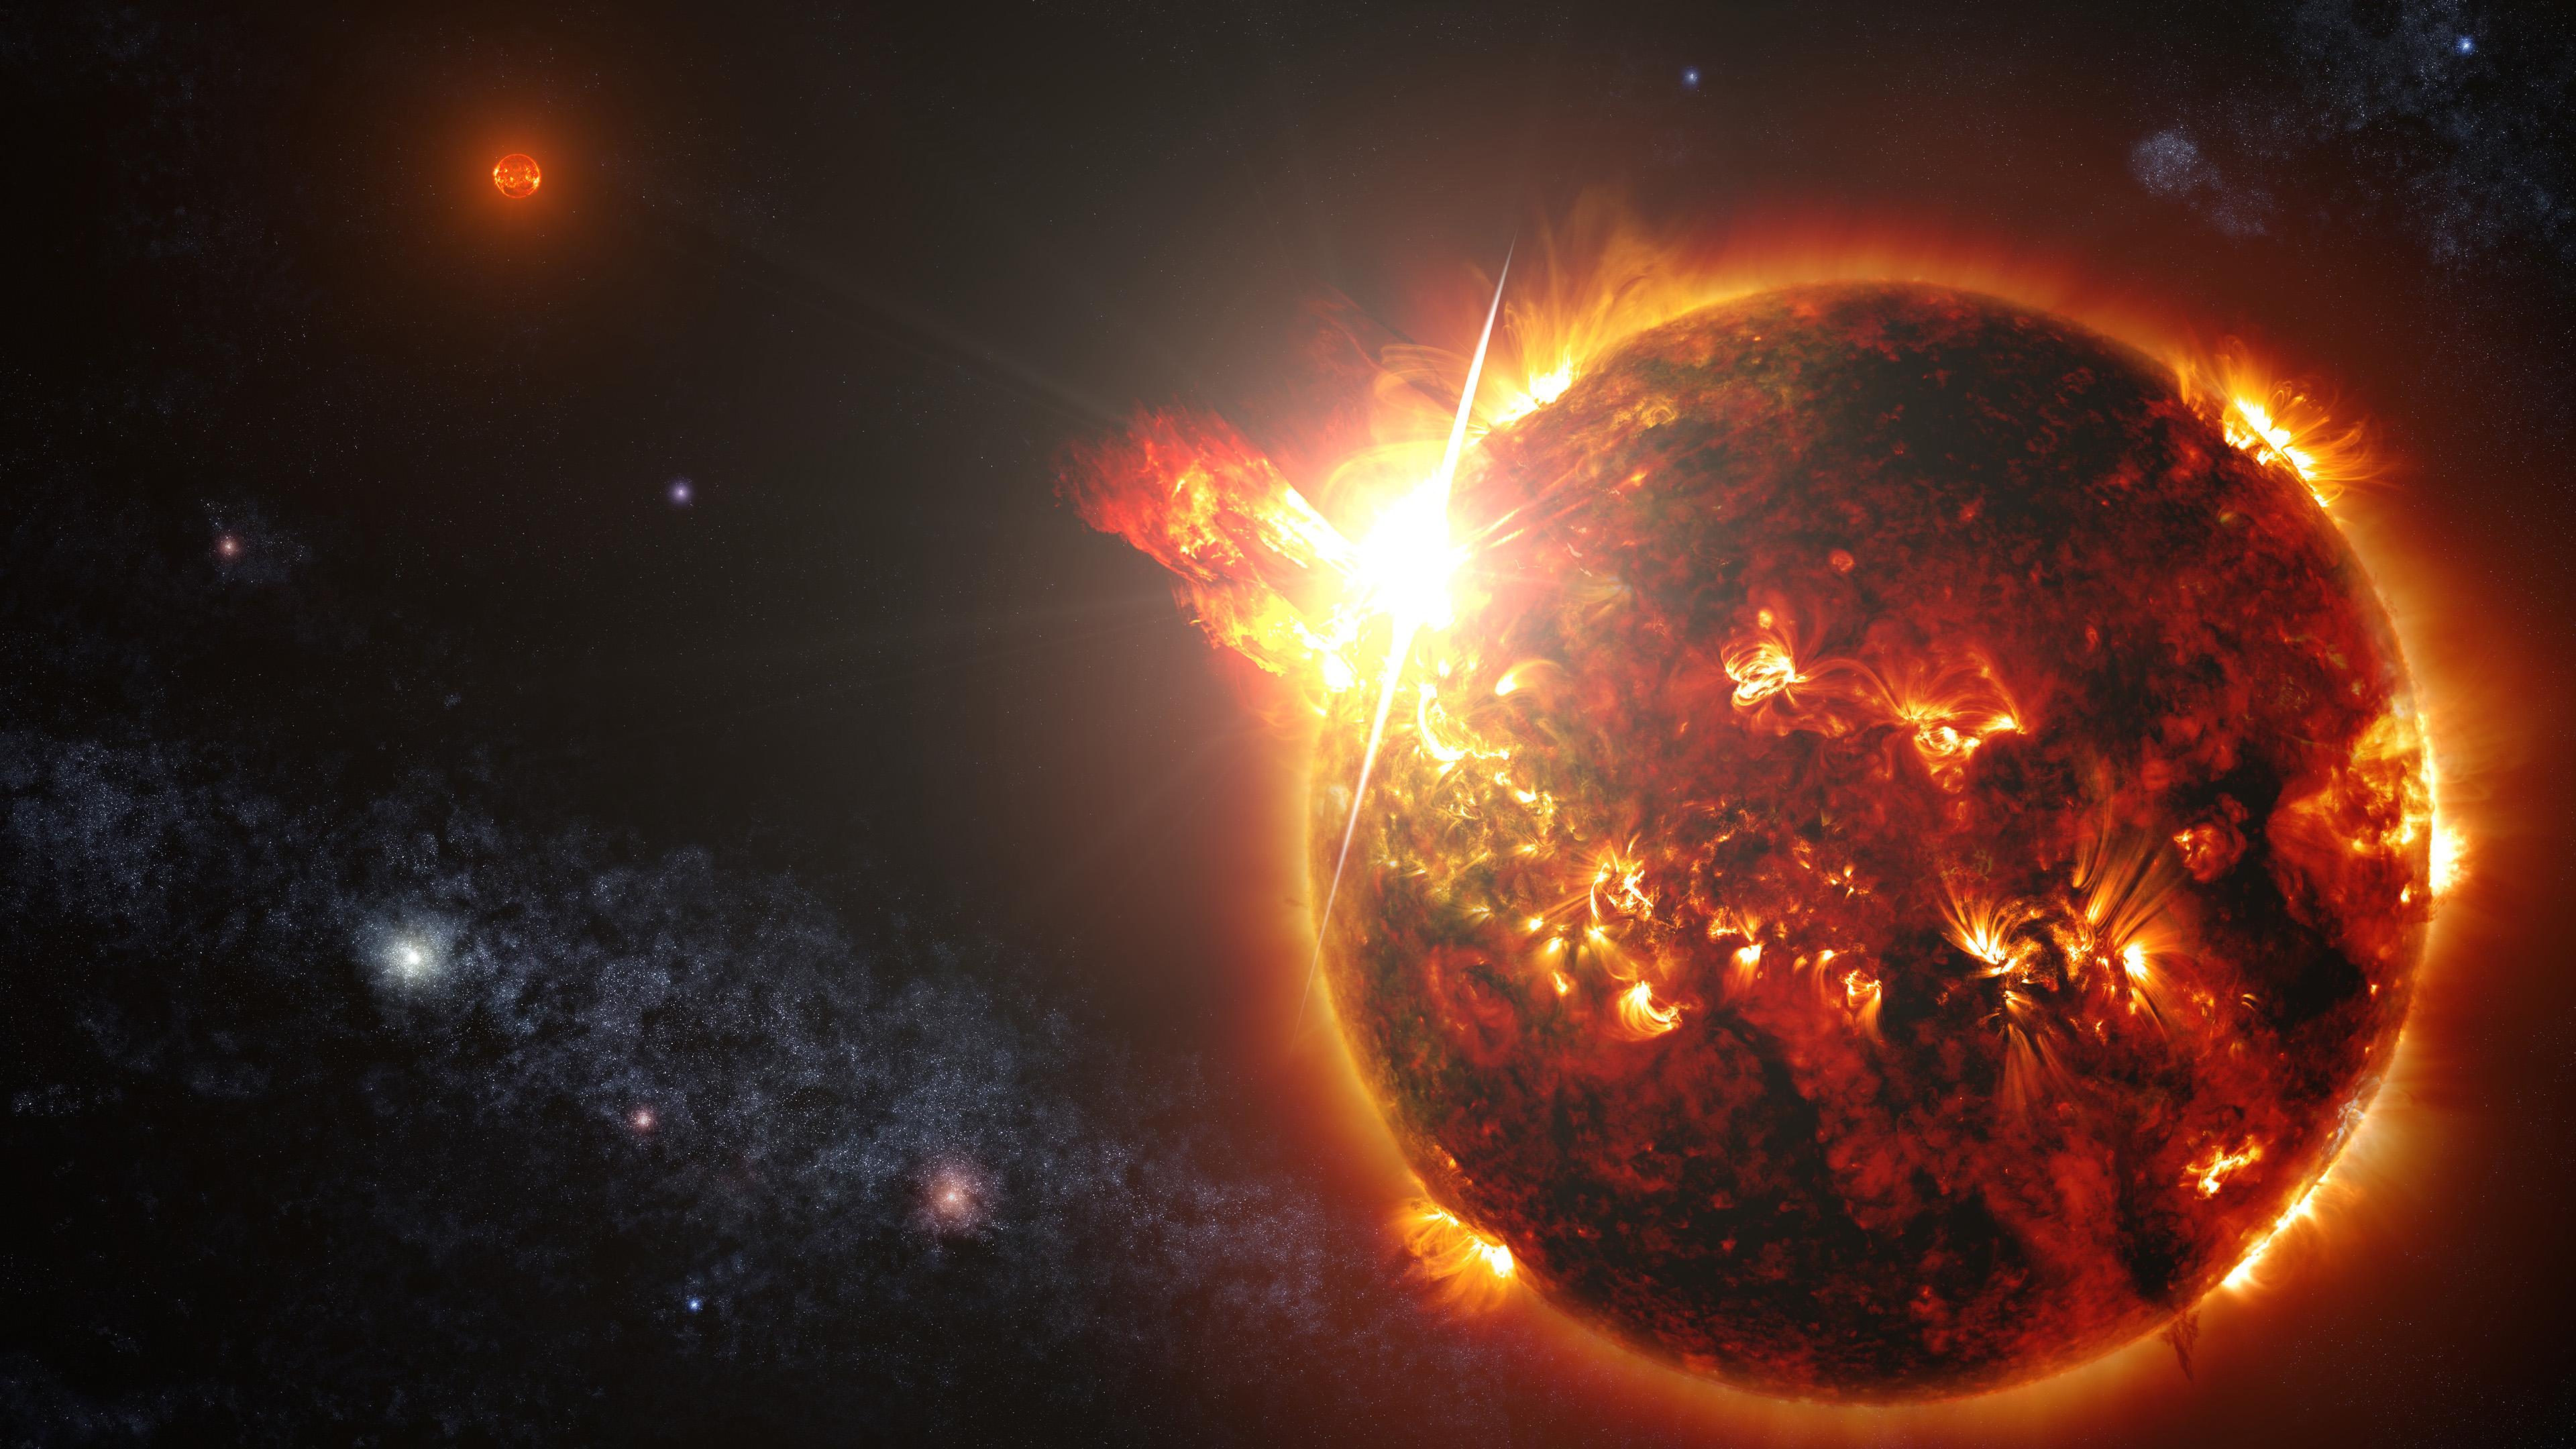 Sun 4k Ultra Hd Wallpaper Background Image 3840x2160 Id 549919